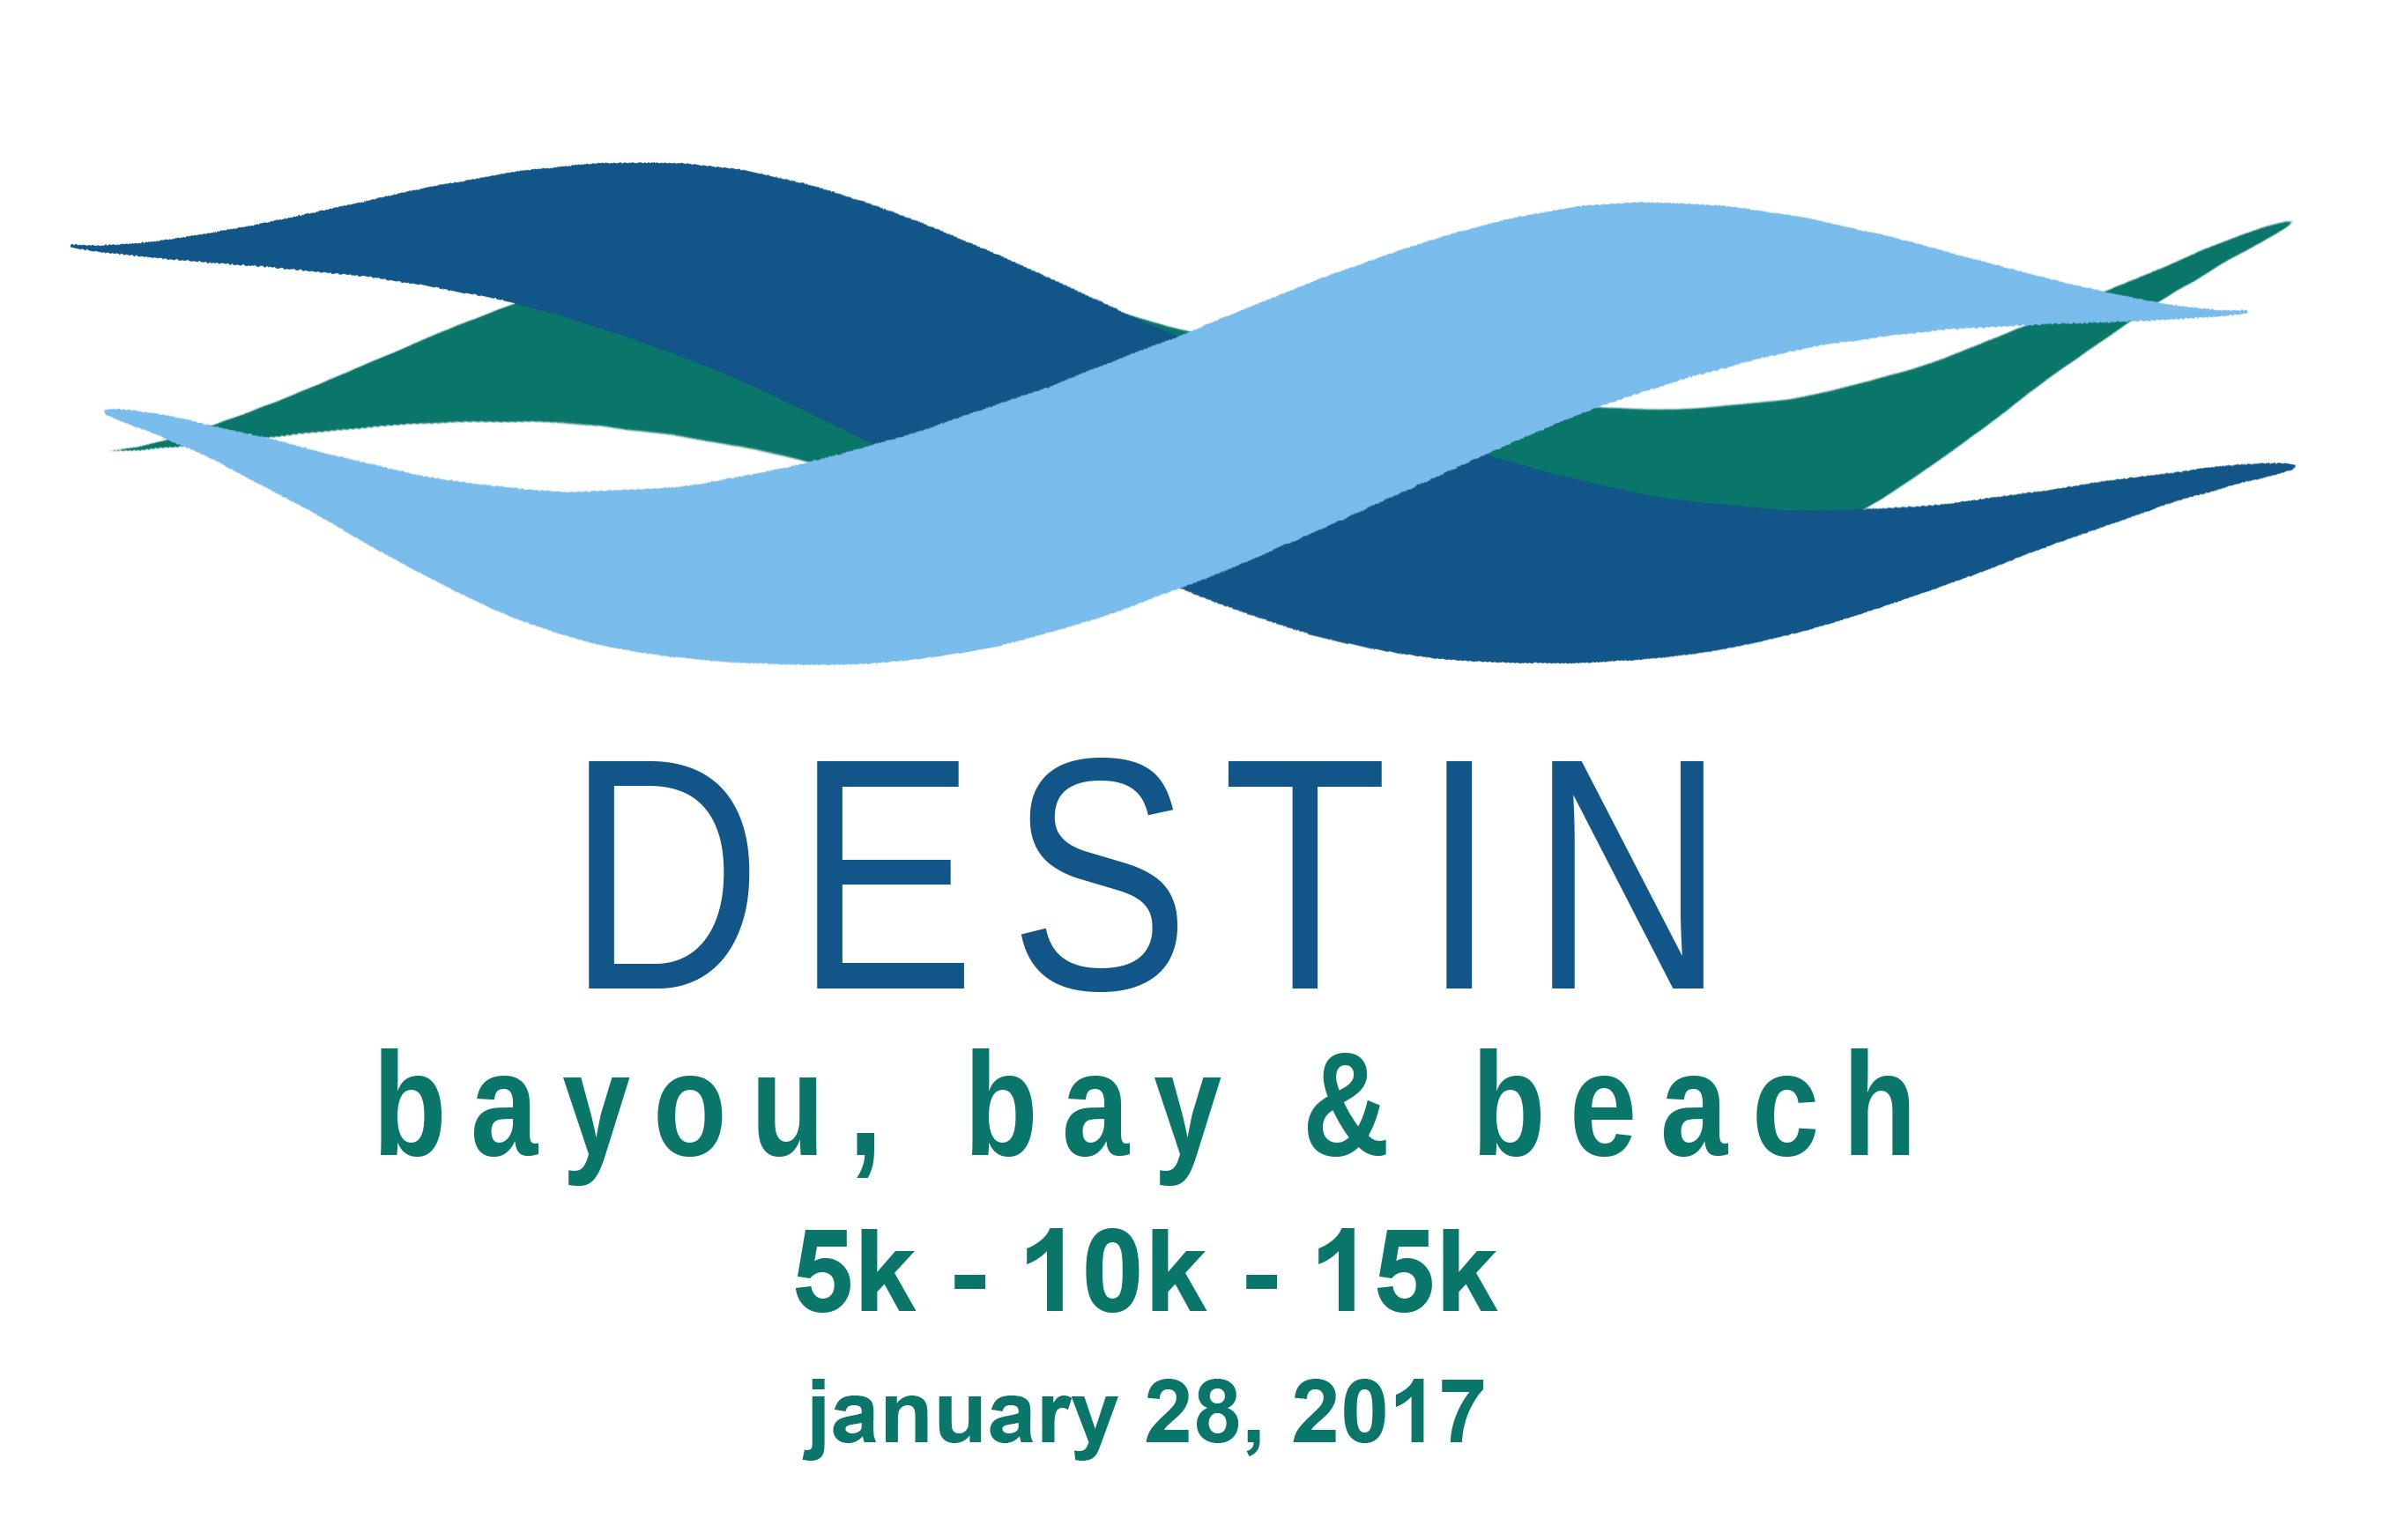 Destin's Bayou, Bay & Beach